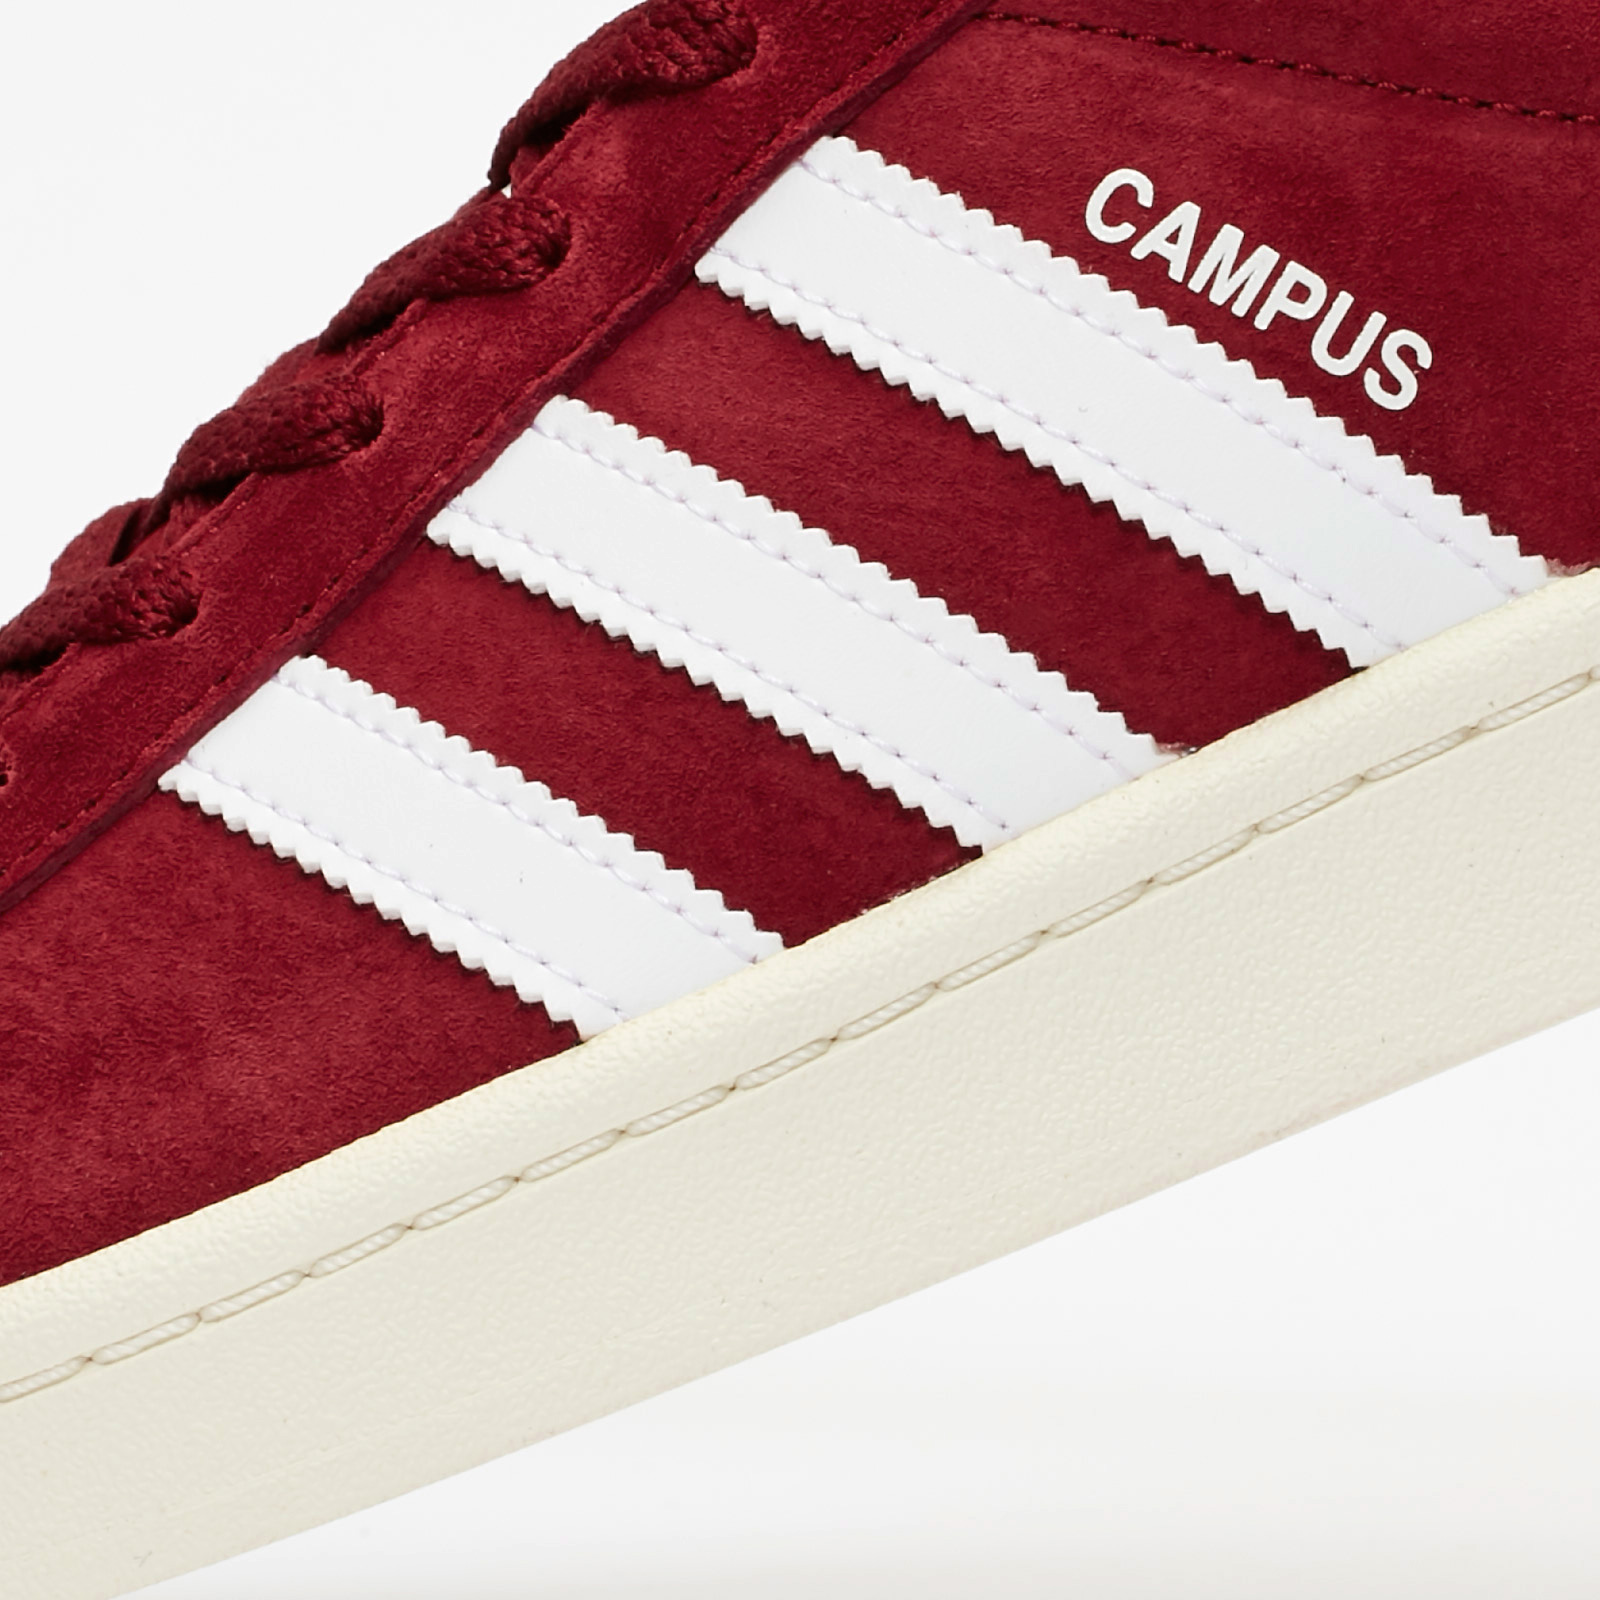 adidas campus bz0087